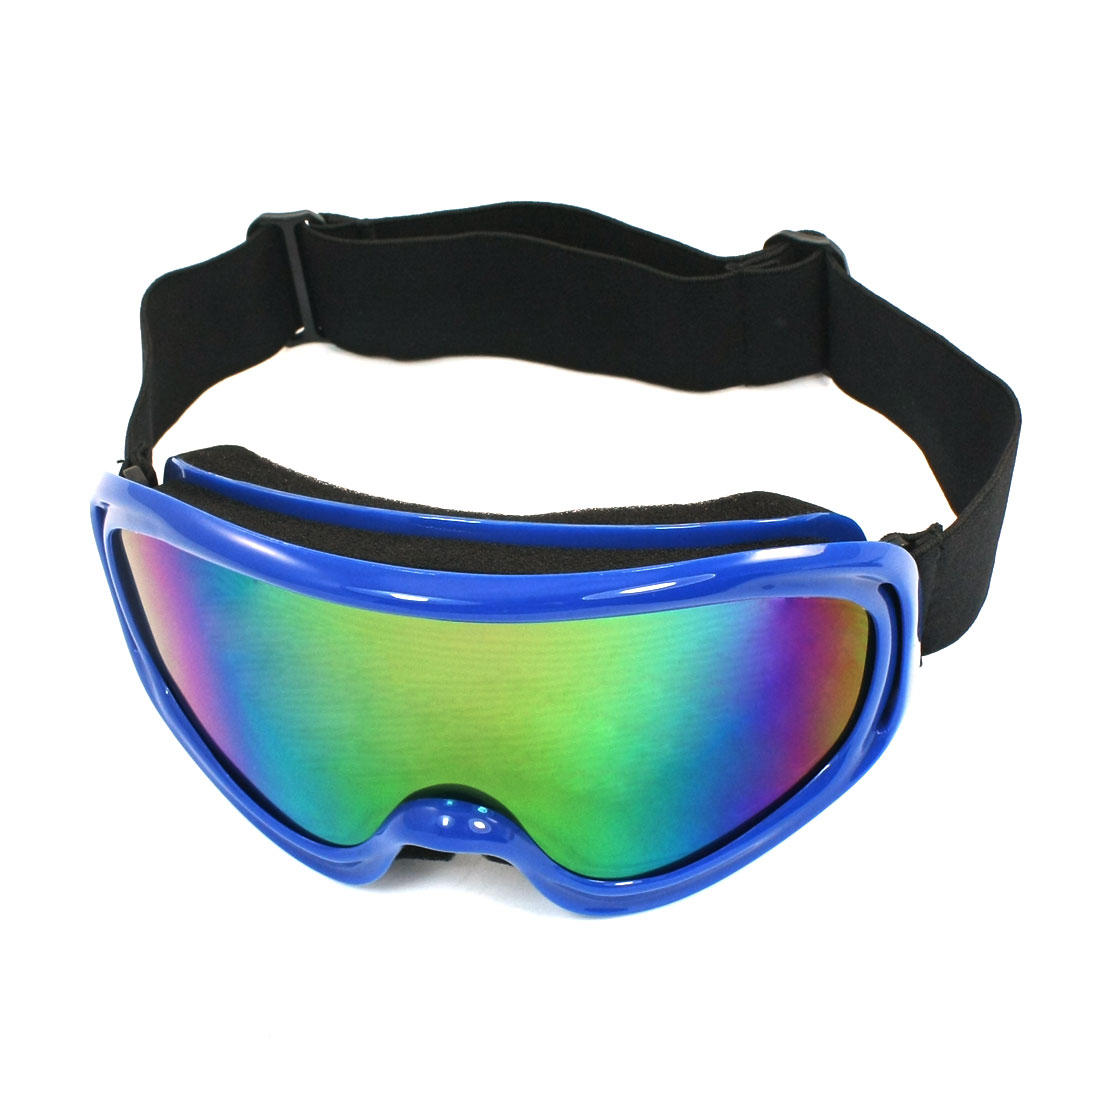 Unique Bargains Blue Frame Coloured Width Lens Eye Wear Ski Goggles for Women Man by